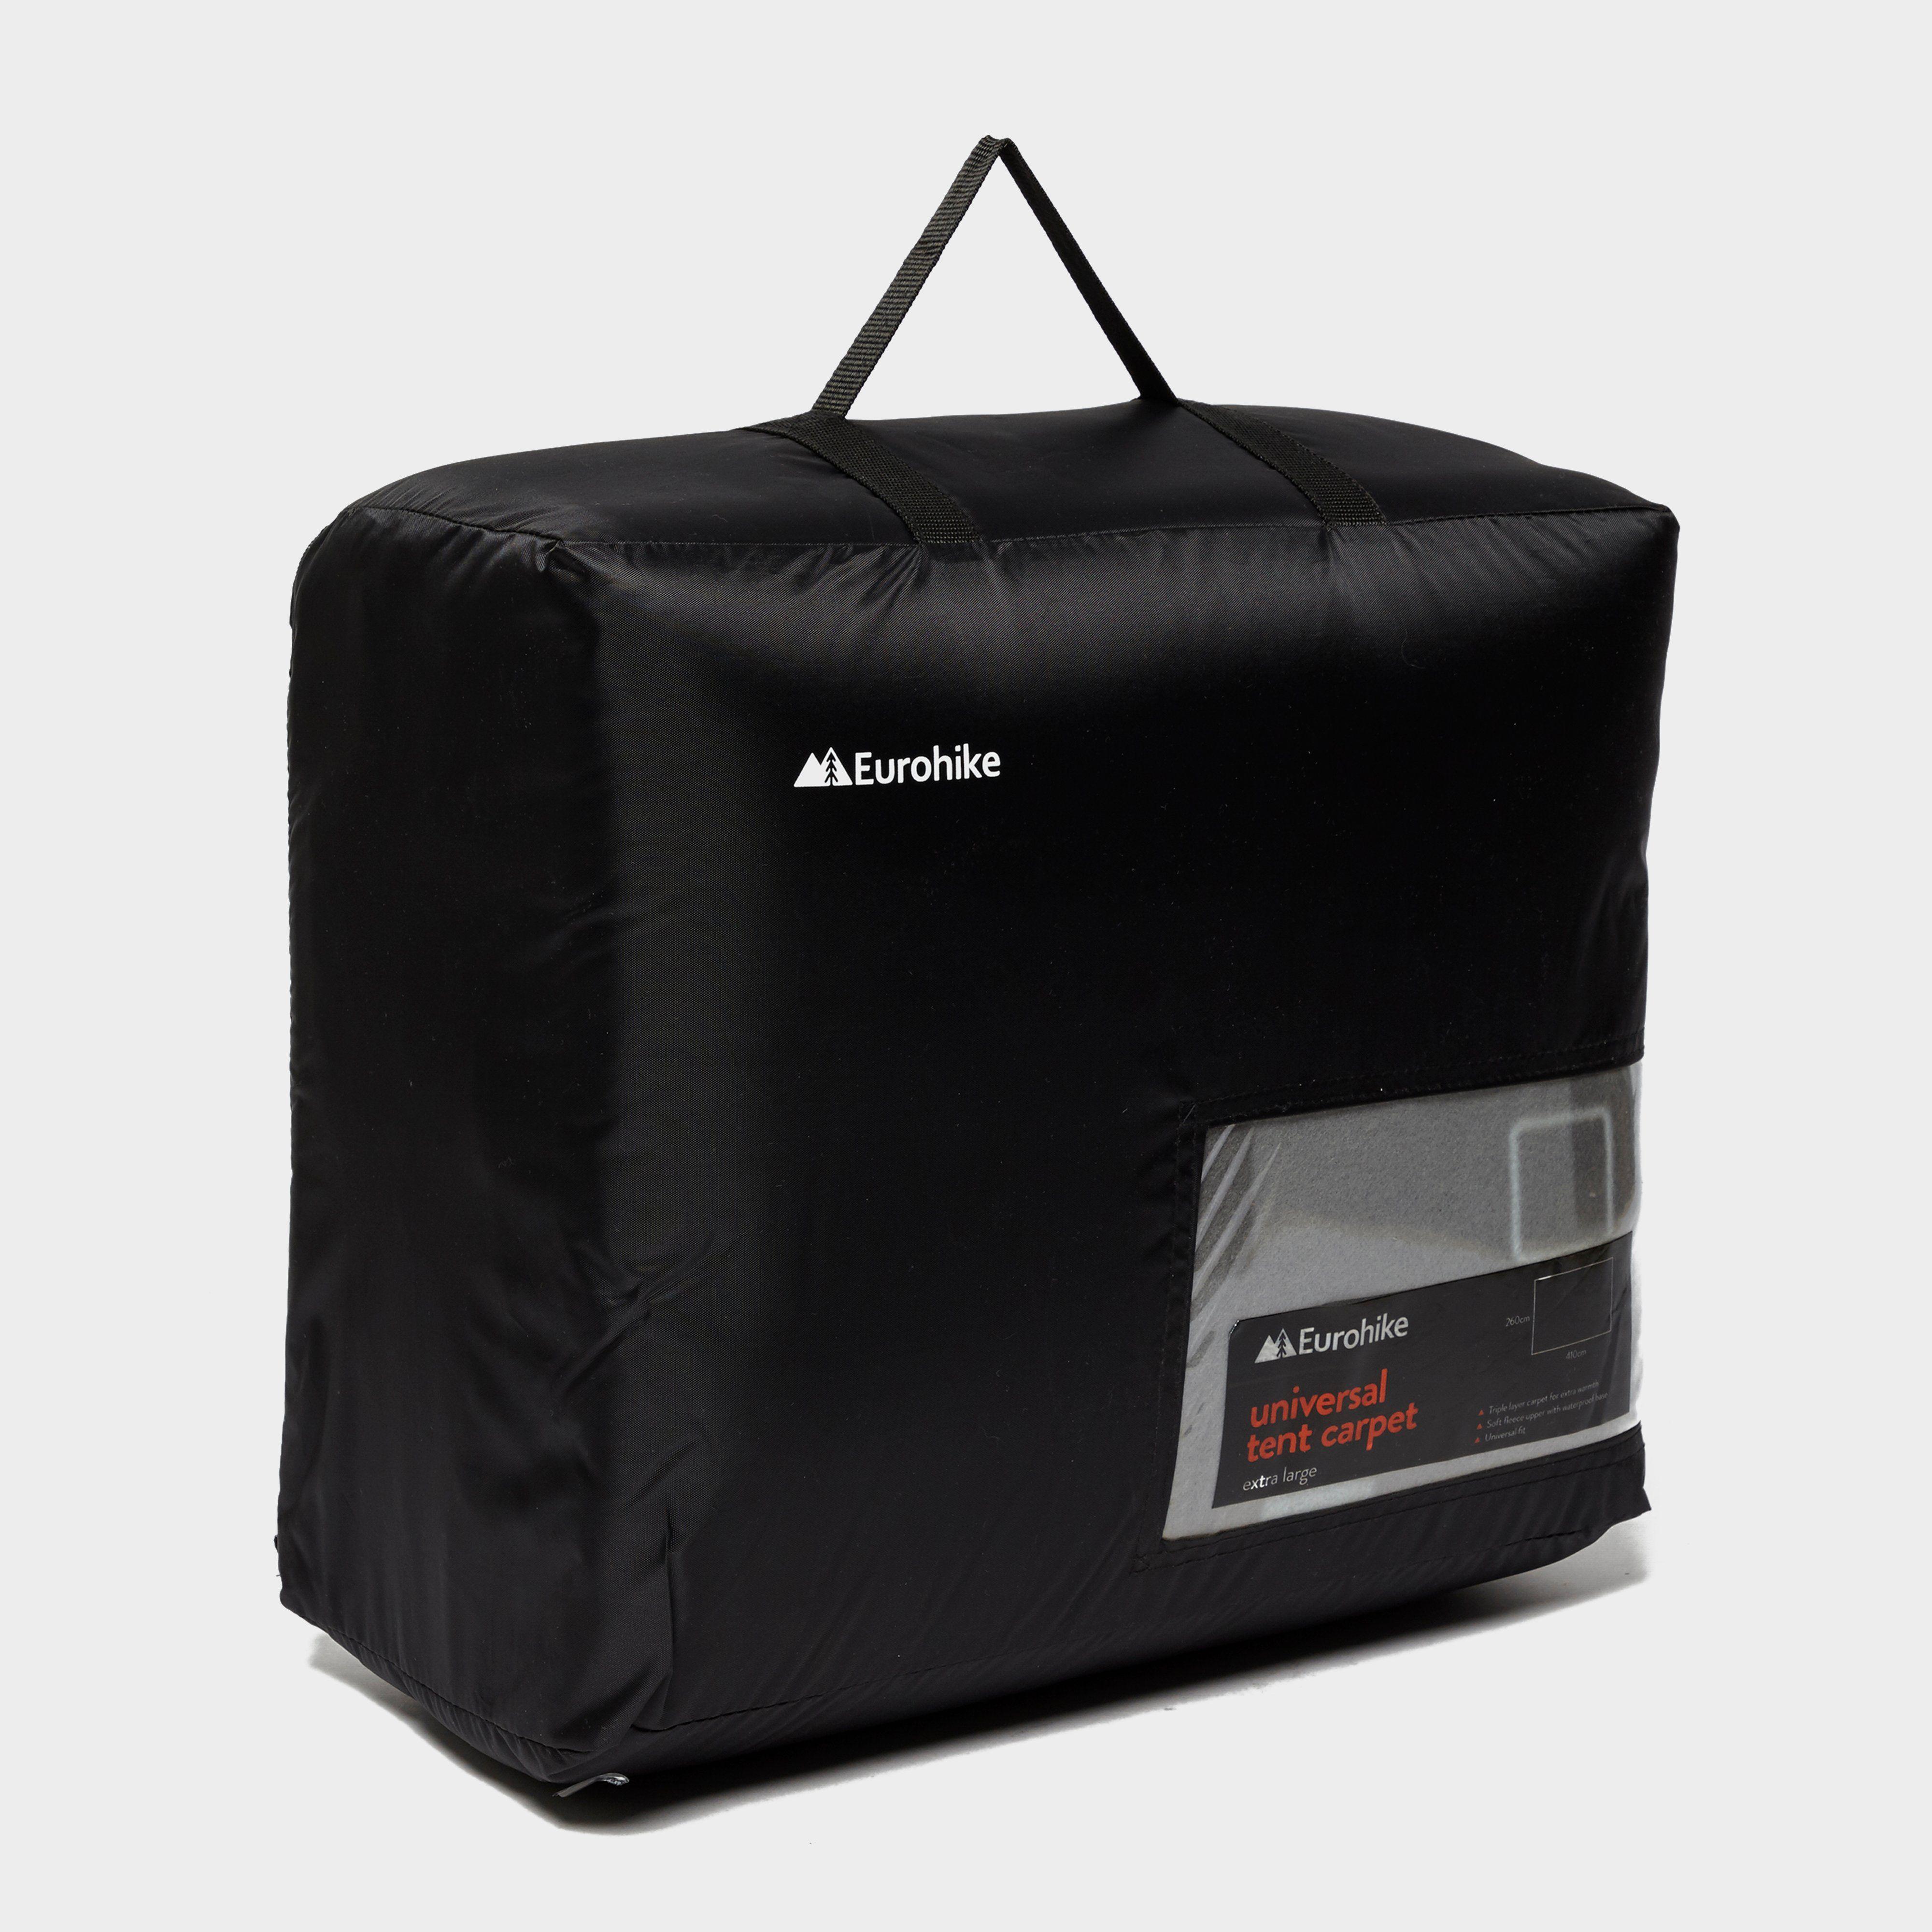 EUROHIKE Universal Tent Carpet 260 x 410 (XL)